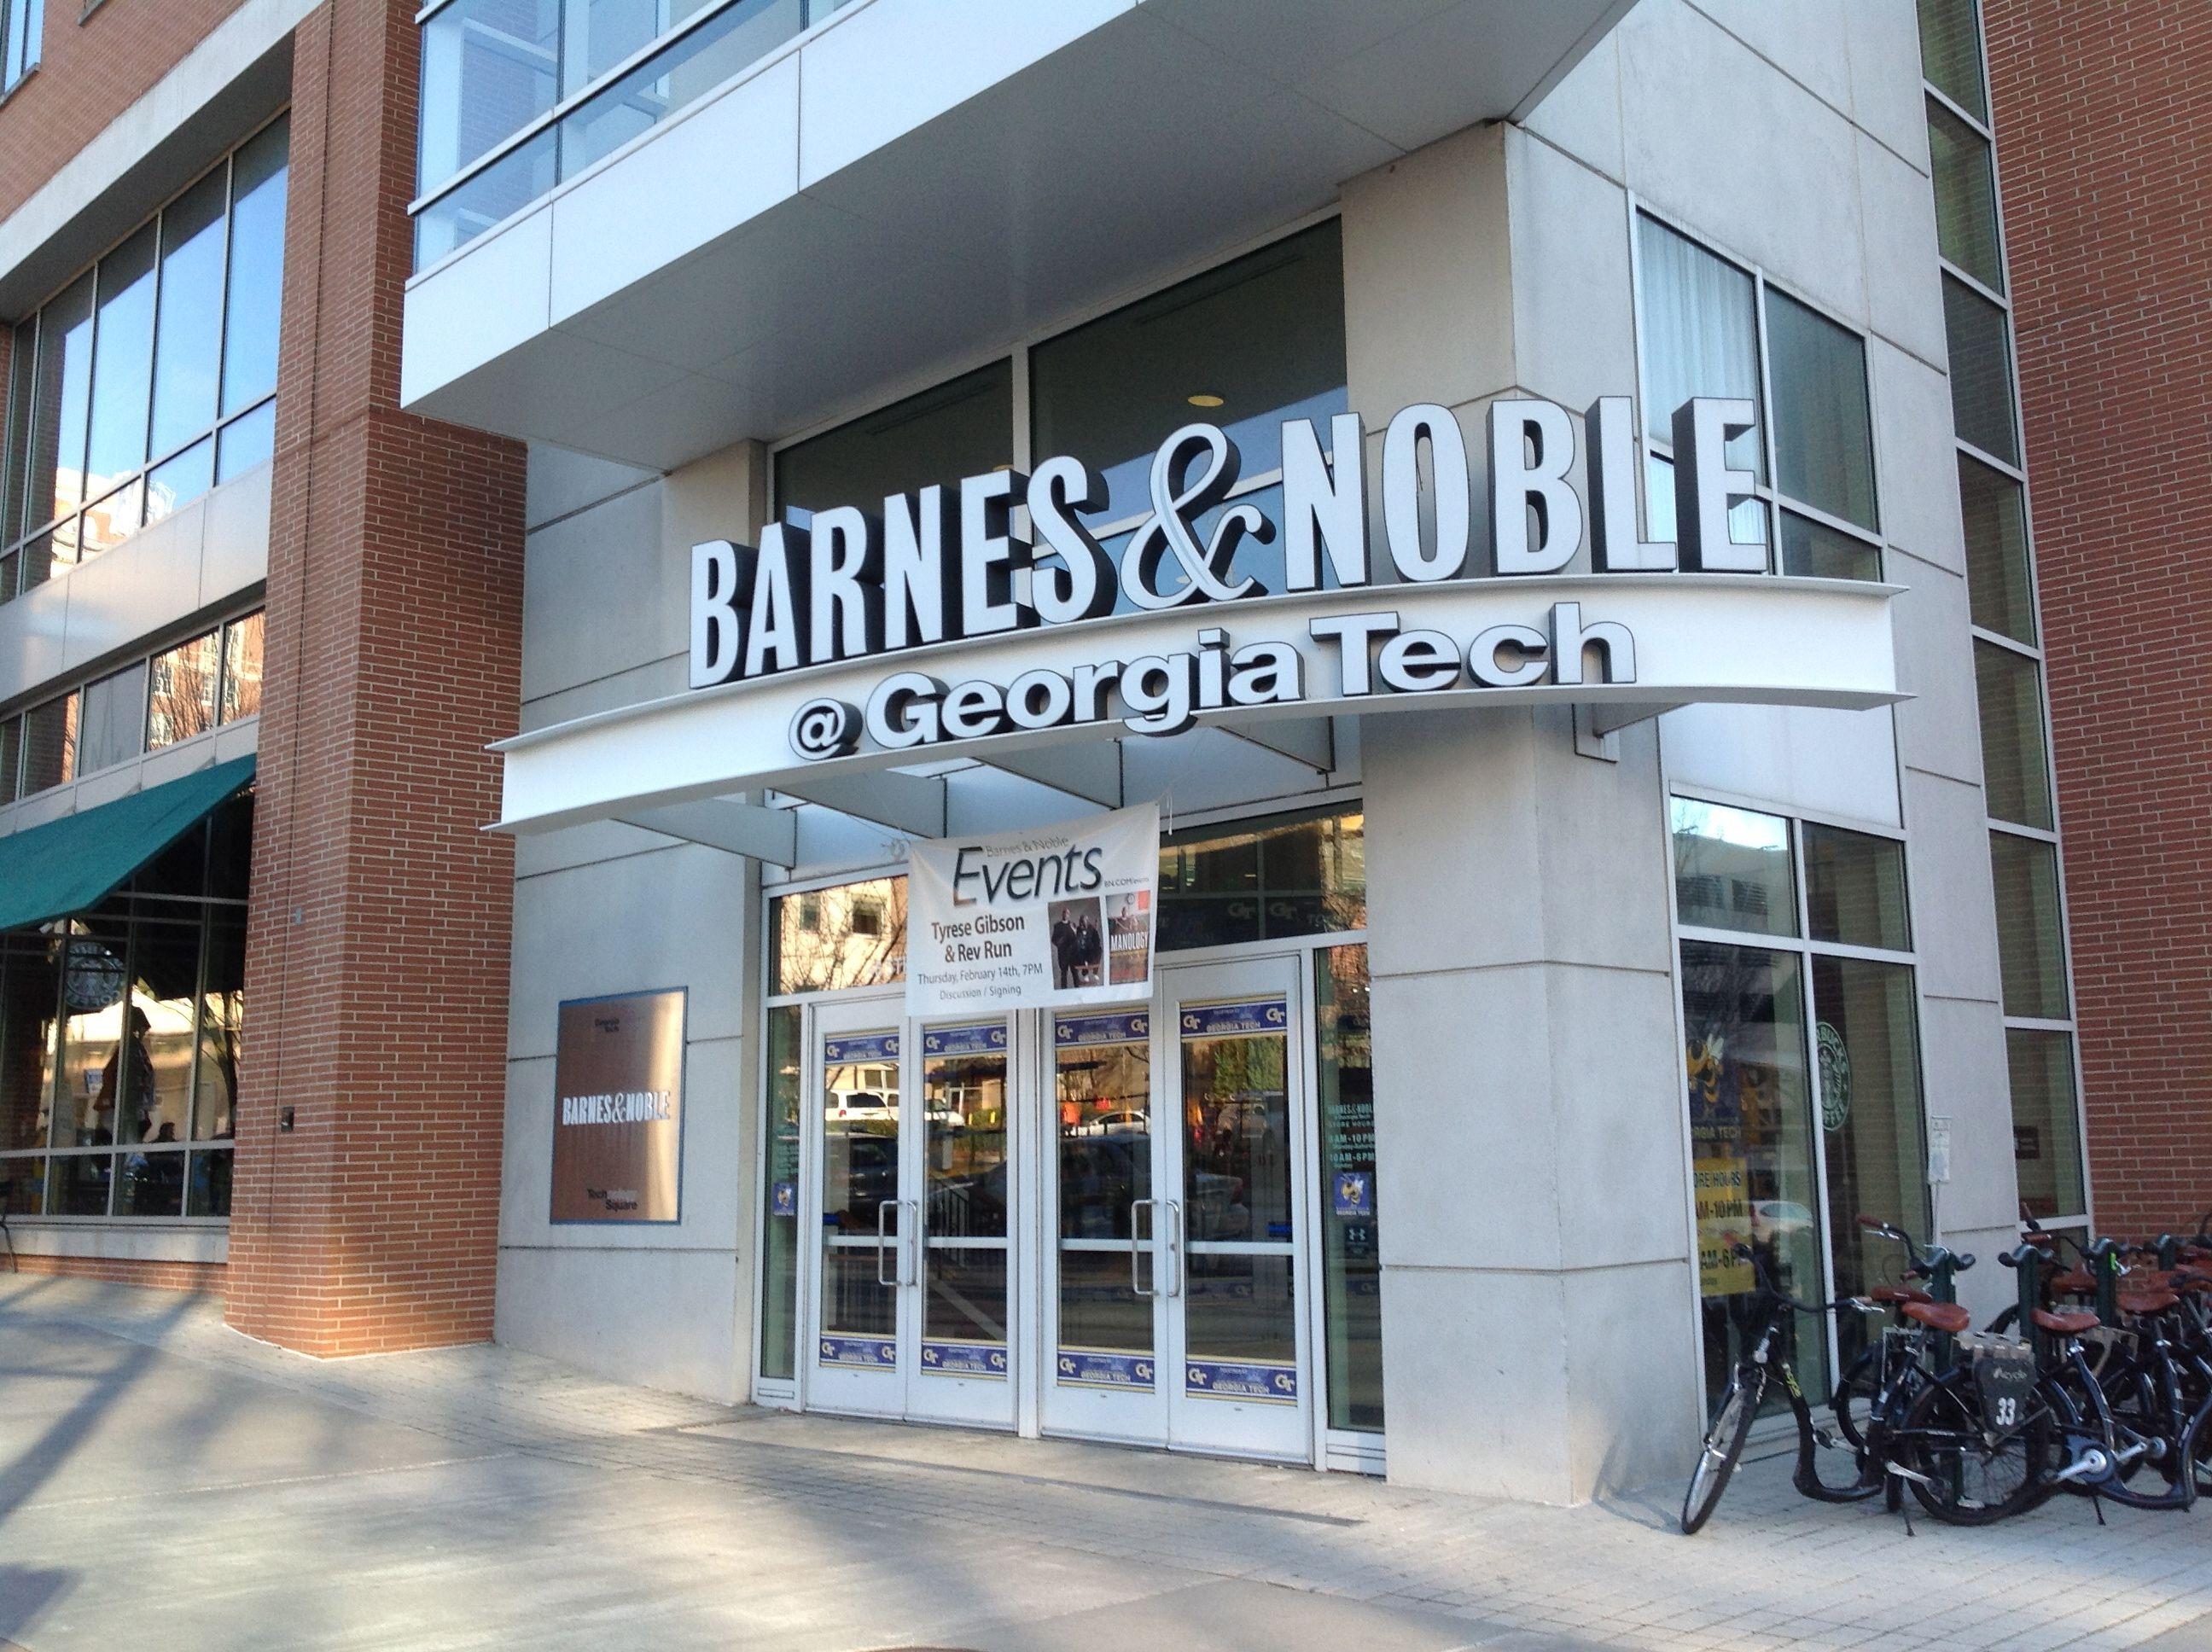 Barnes And Noble And Georgia Tech Bookstore In Tech Square